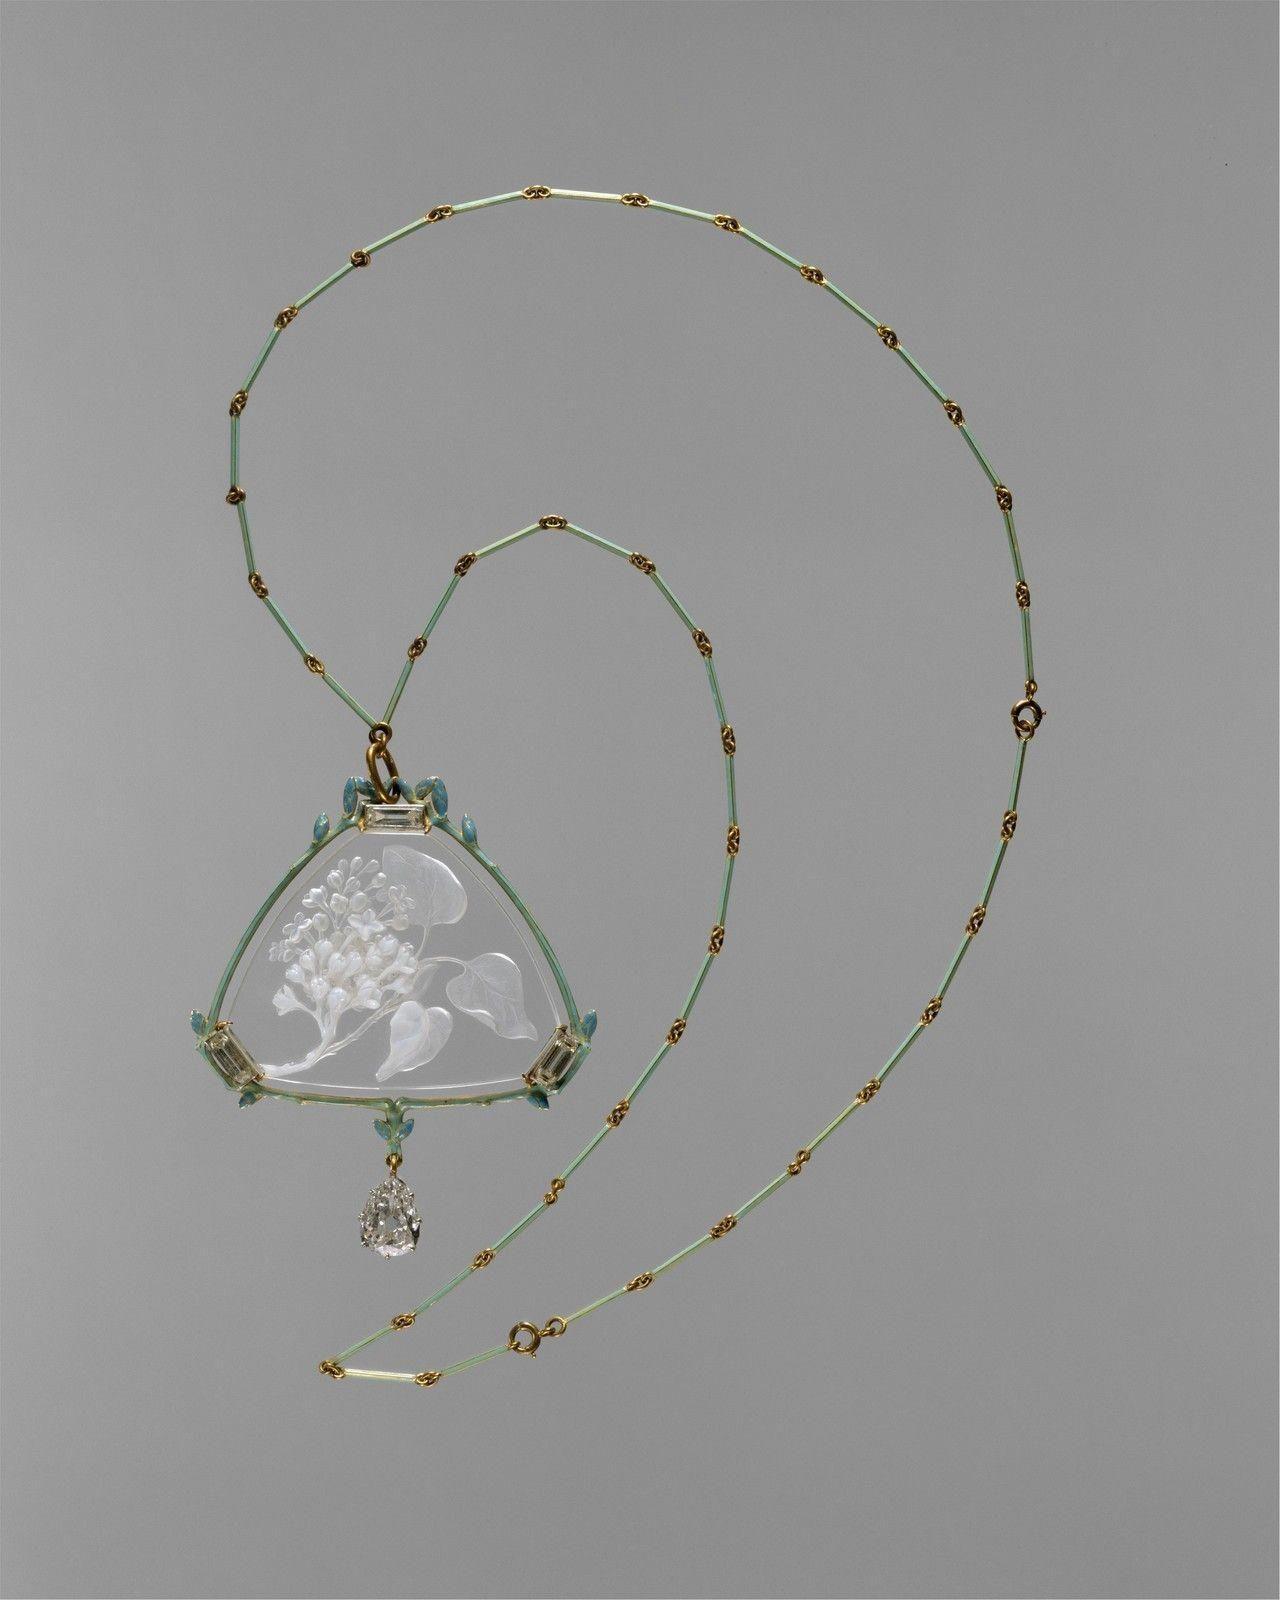 Fine Jewelry | Designer Jewelry Brands | Very Unique Jewelry